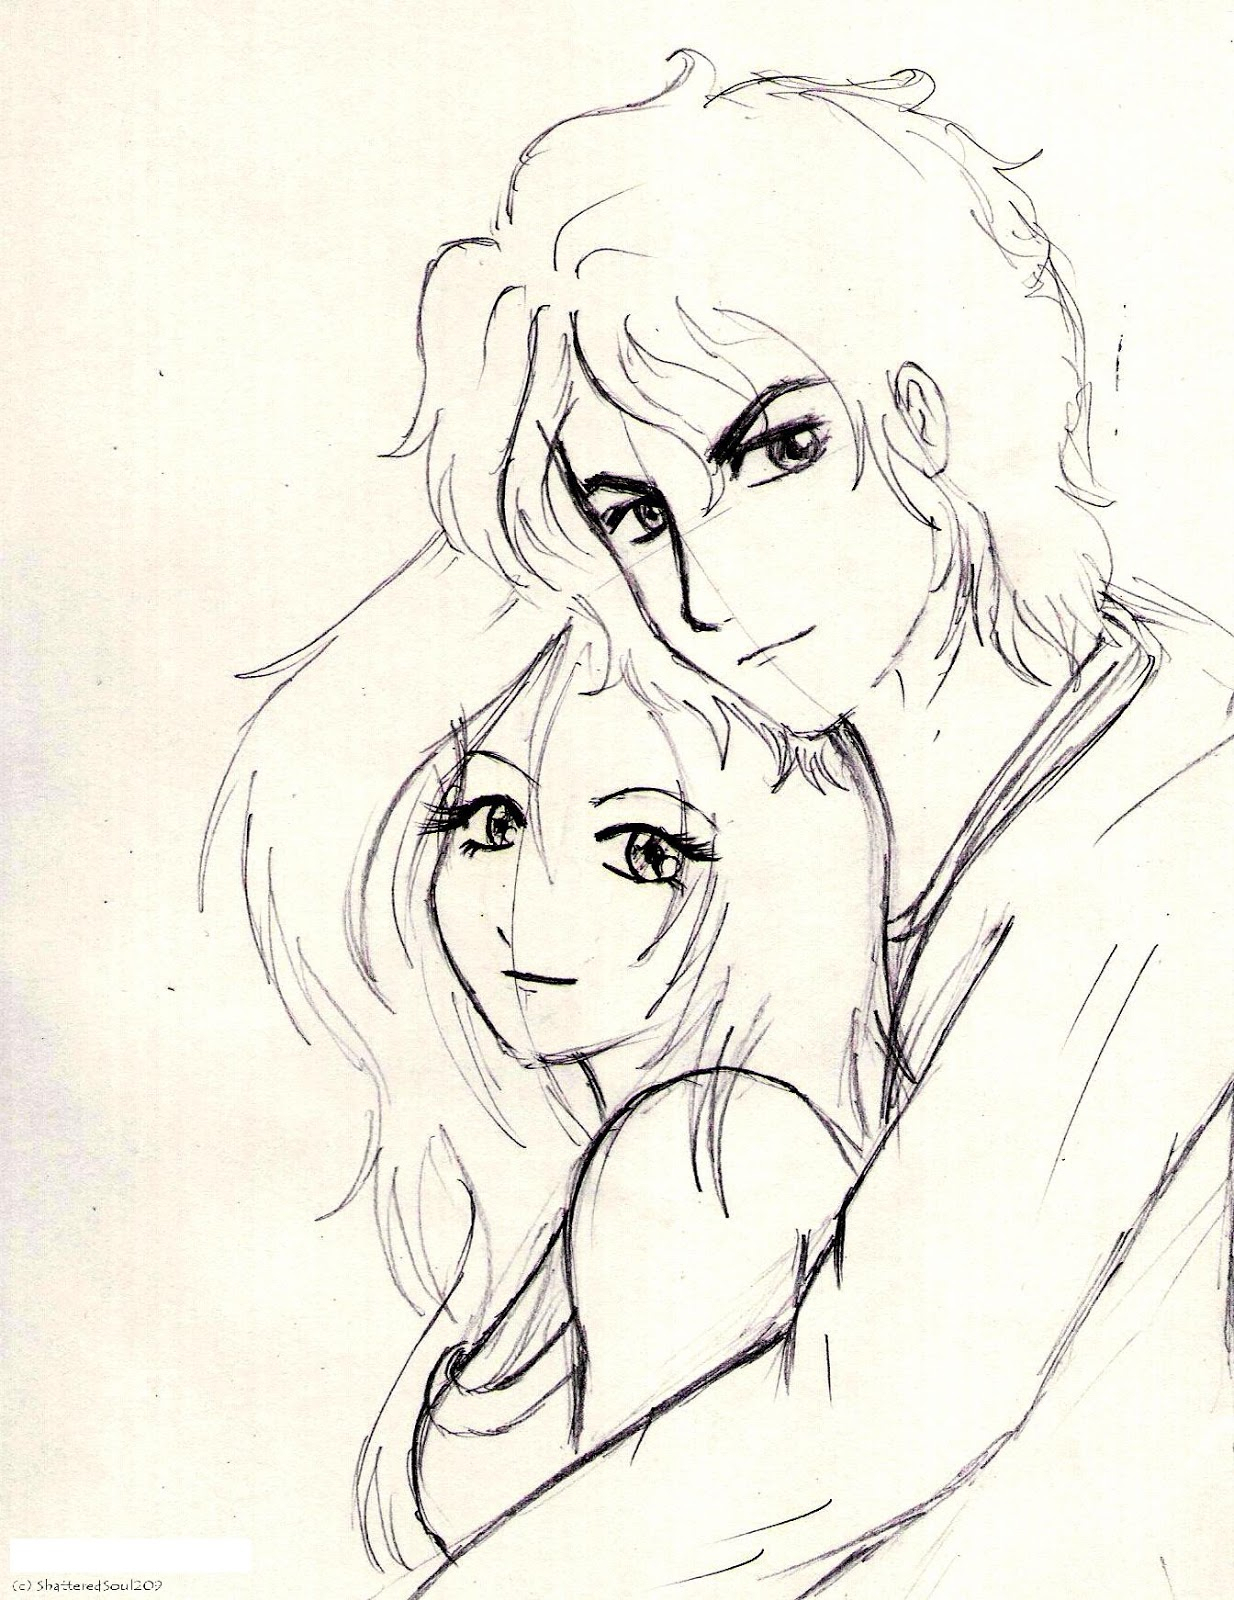 1234x1600 Color Pencil Sketch.of Love Couples Kissing Couple (Prismacolor